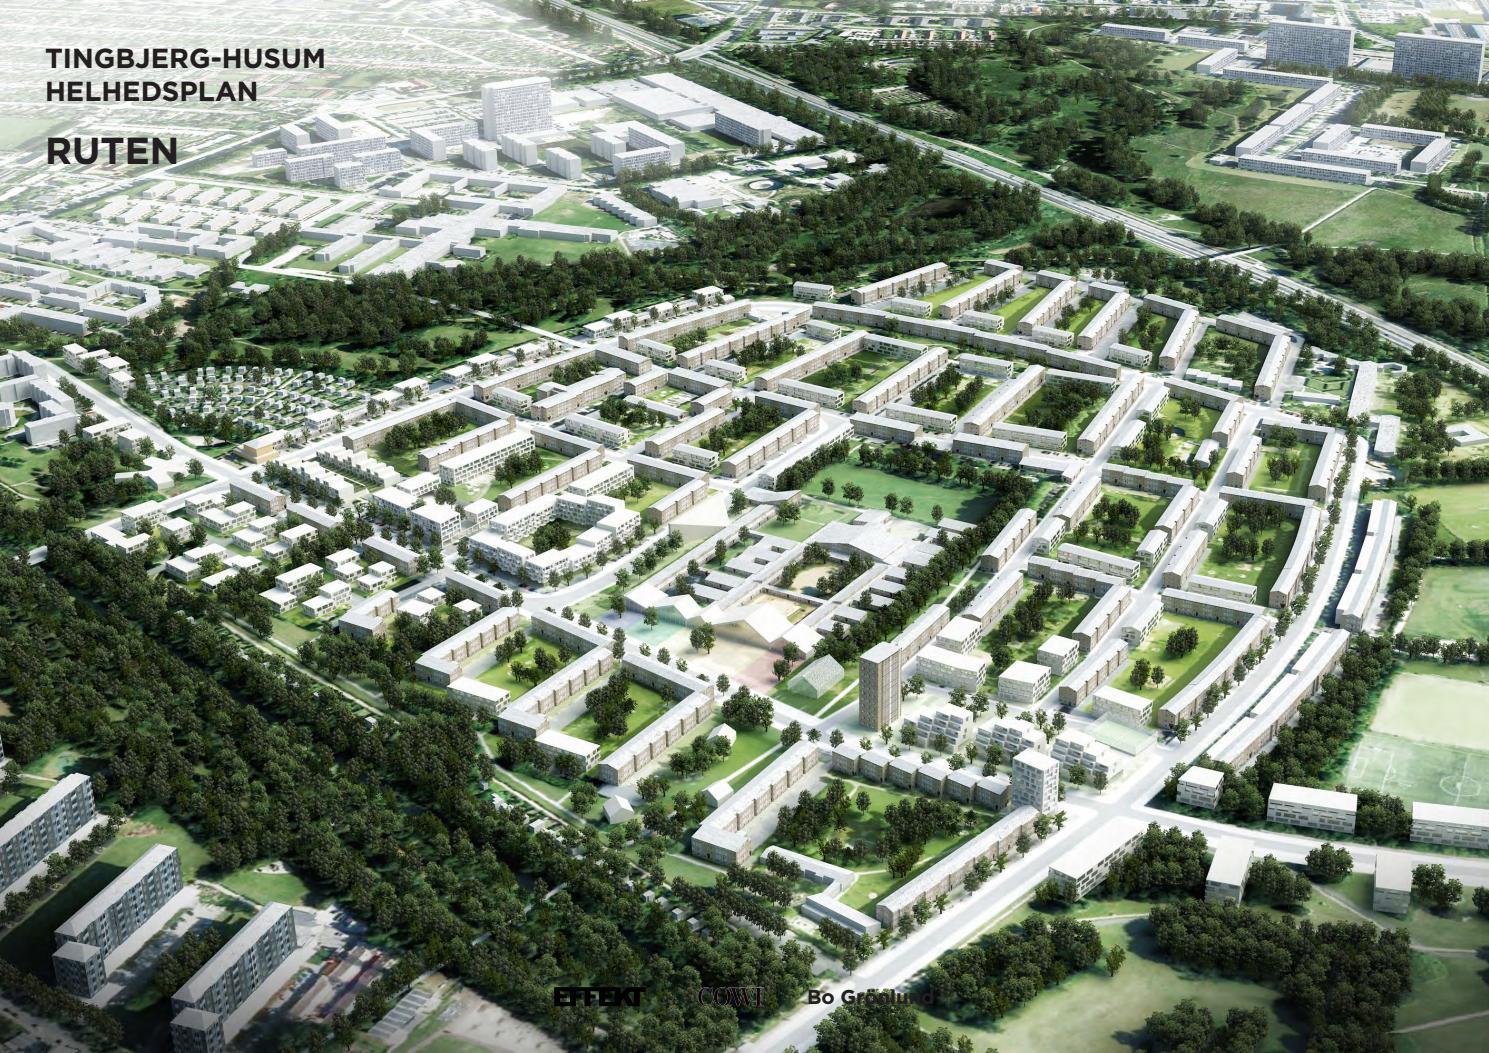 Helhedsplan Ruten 2015 By Tingbjerg Byudvikling Issuu